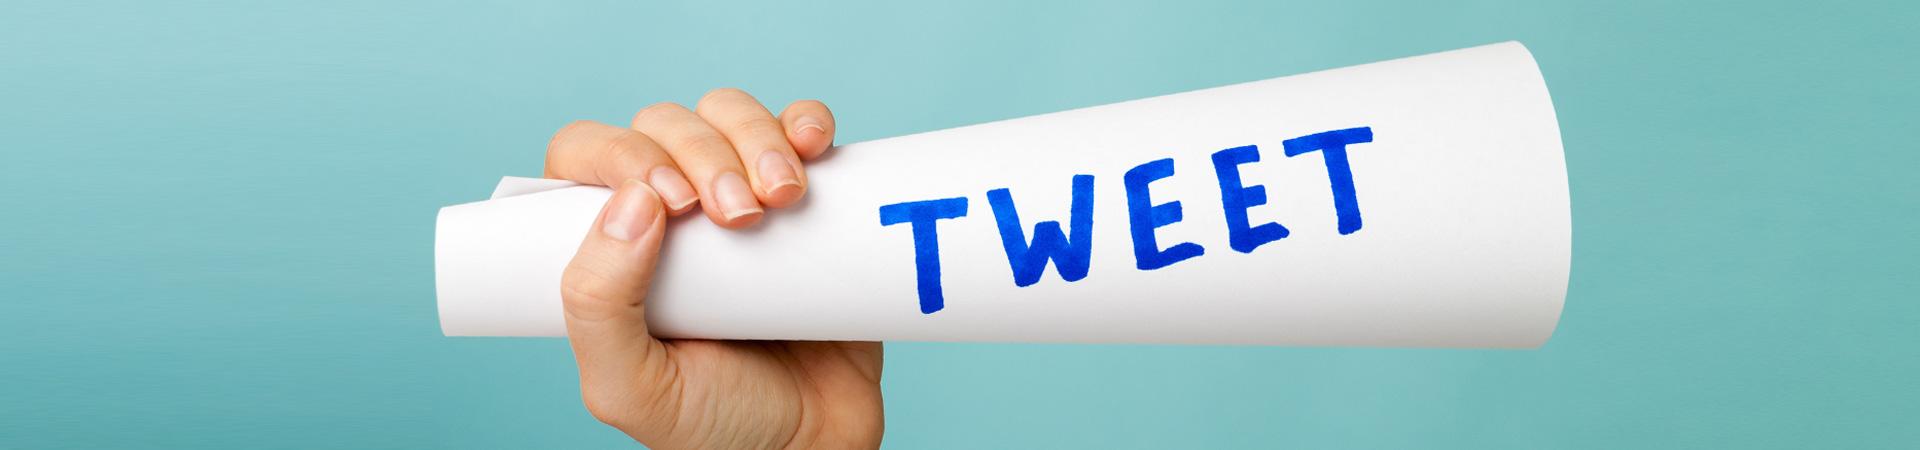 Kundenfeedback in Social Media teilen